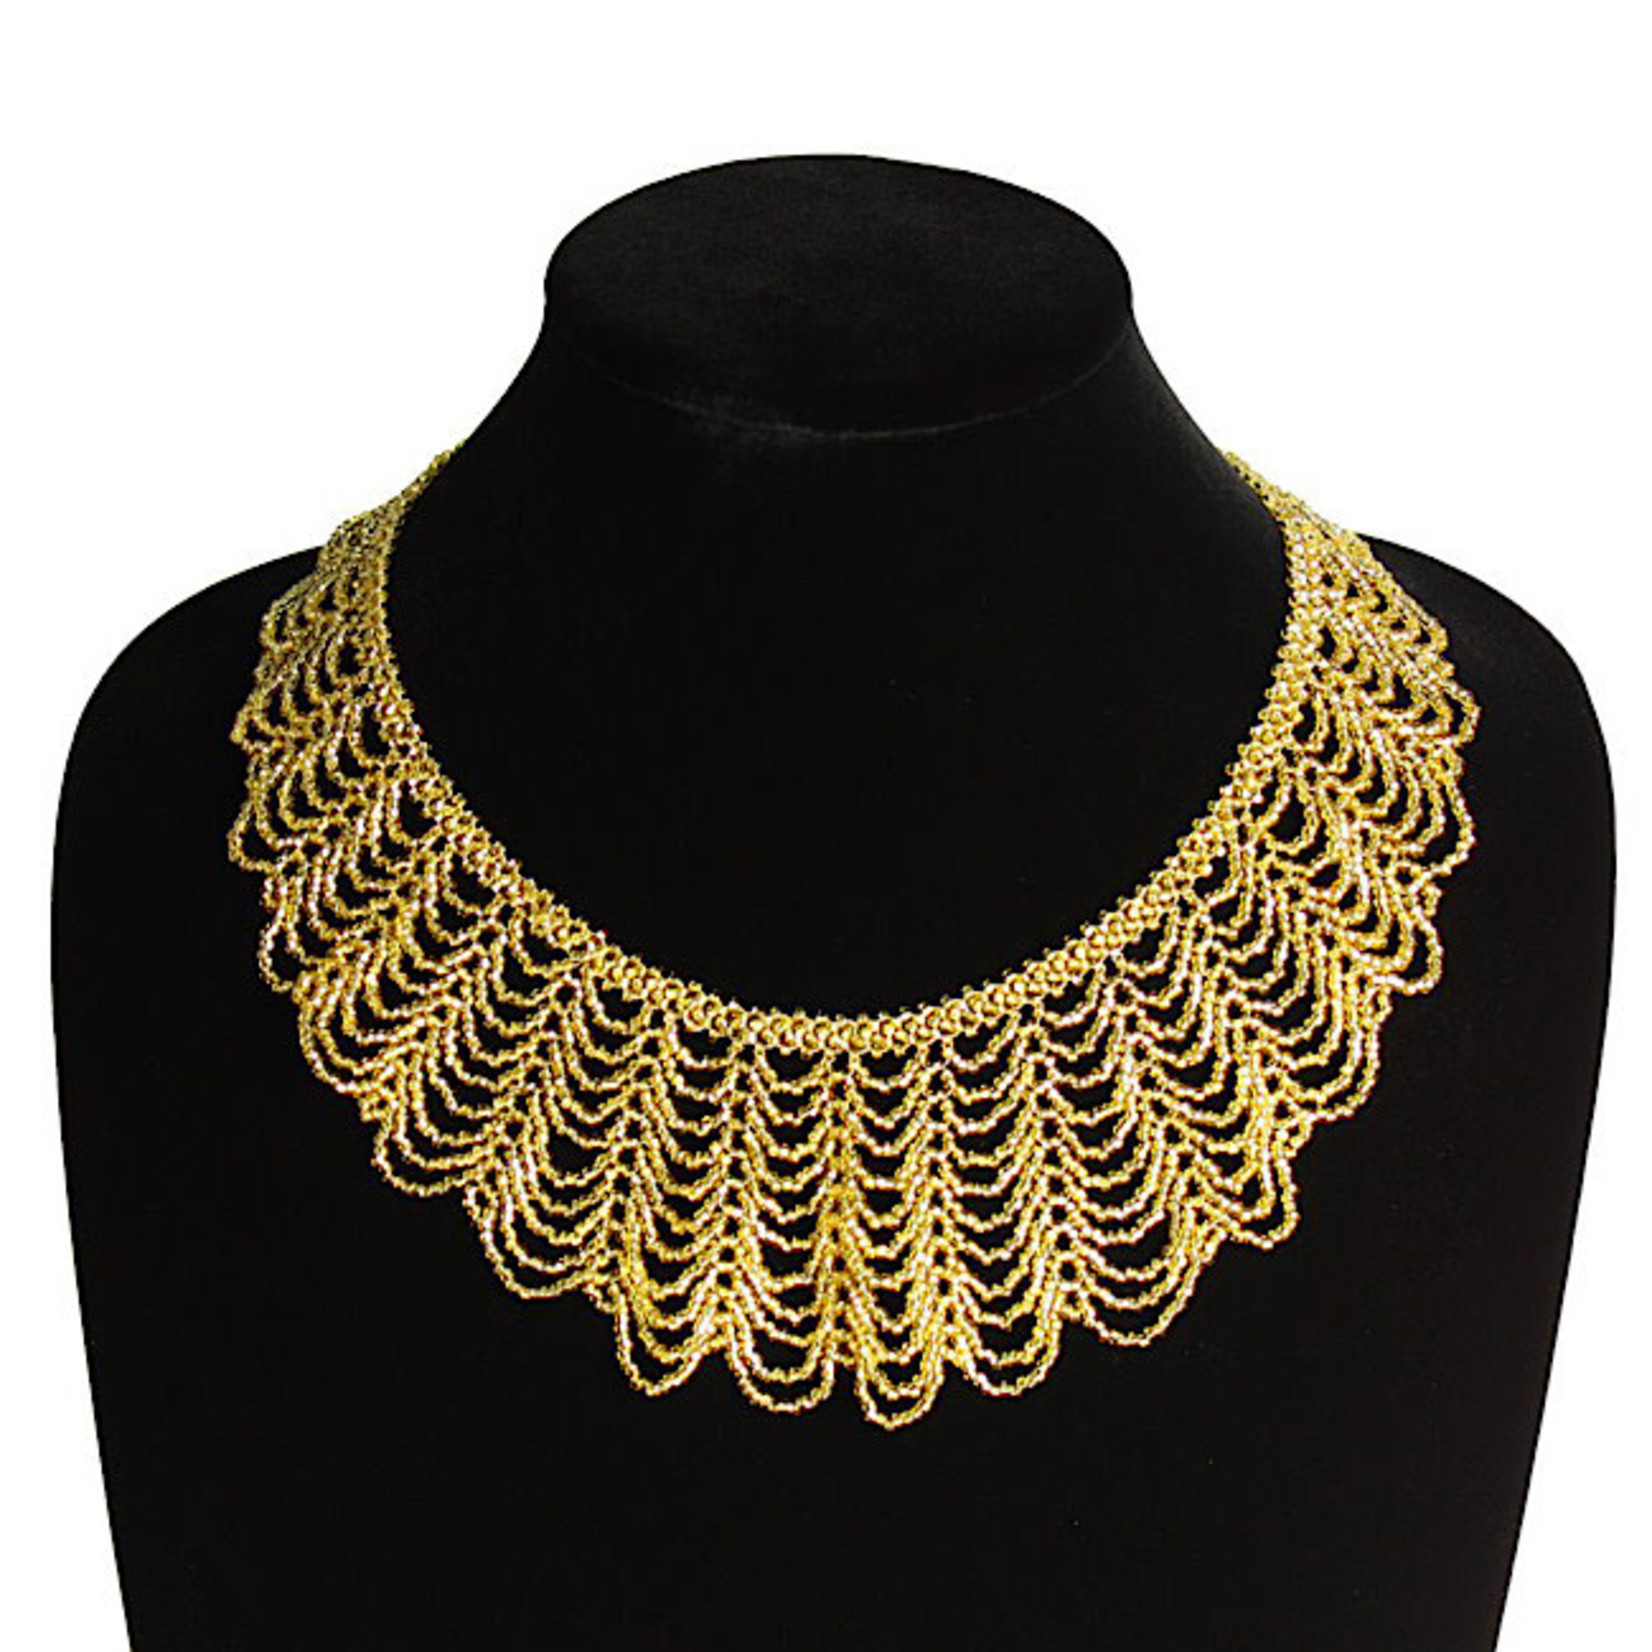 Necklace - Ruth Bader Ginsburg Collar (Gold)